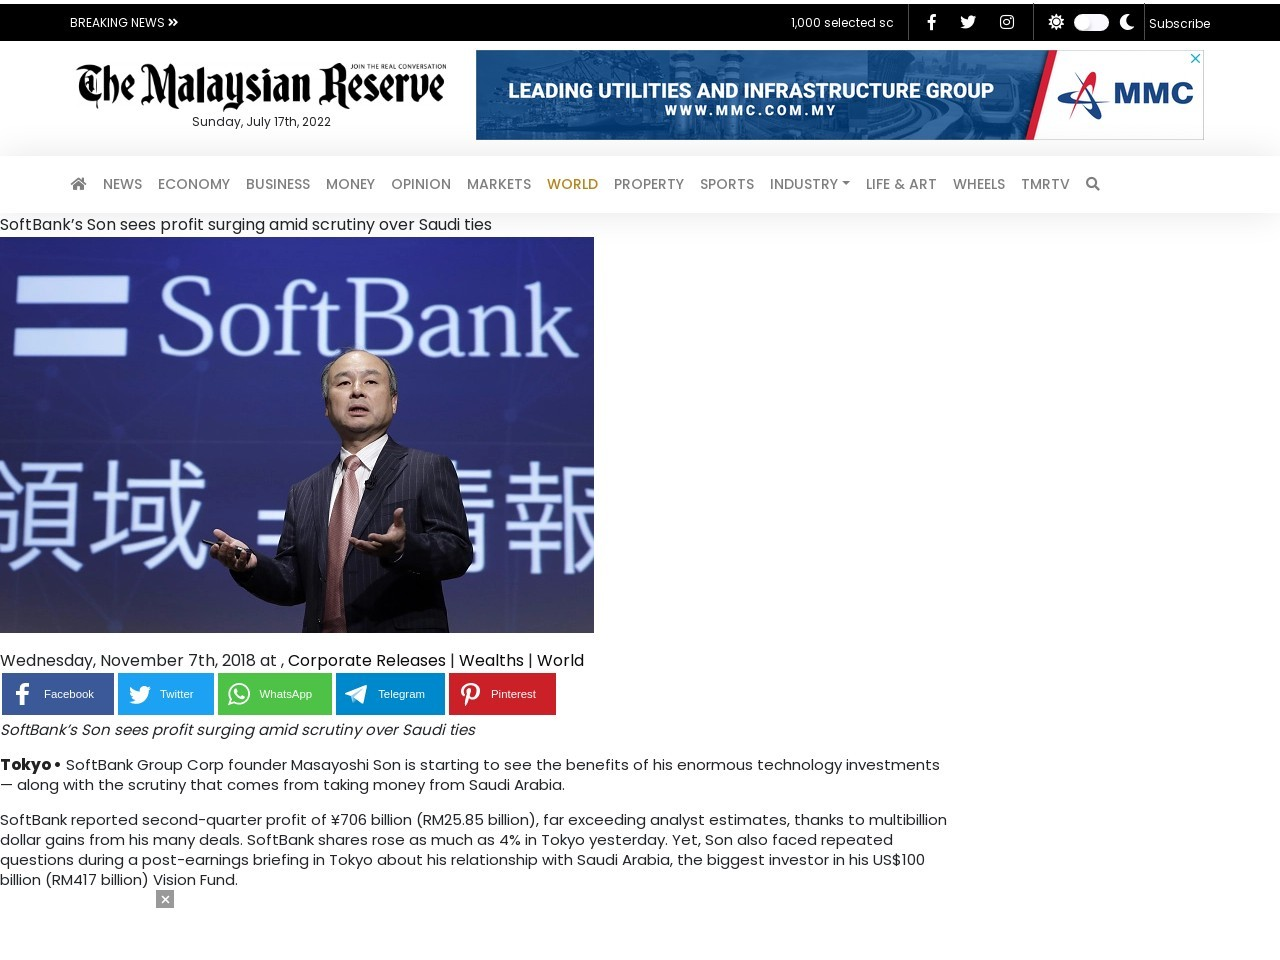 SoftBank's Son sees profit surging amid scrutiny over Saudi ties